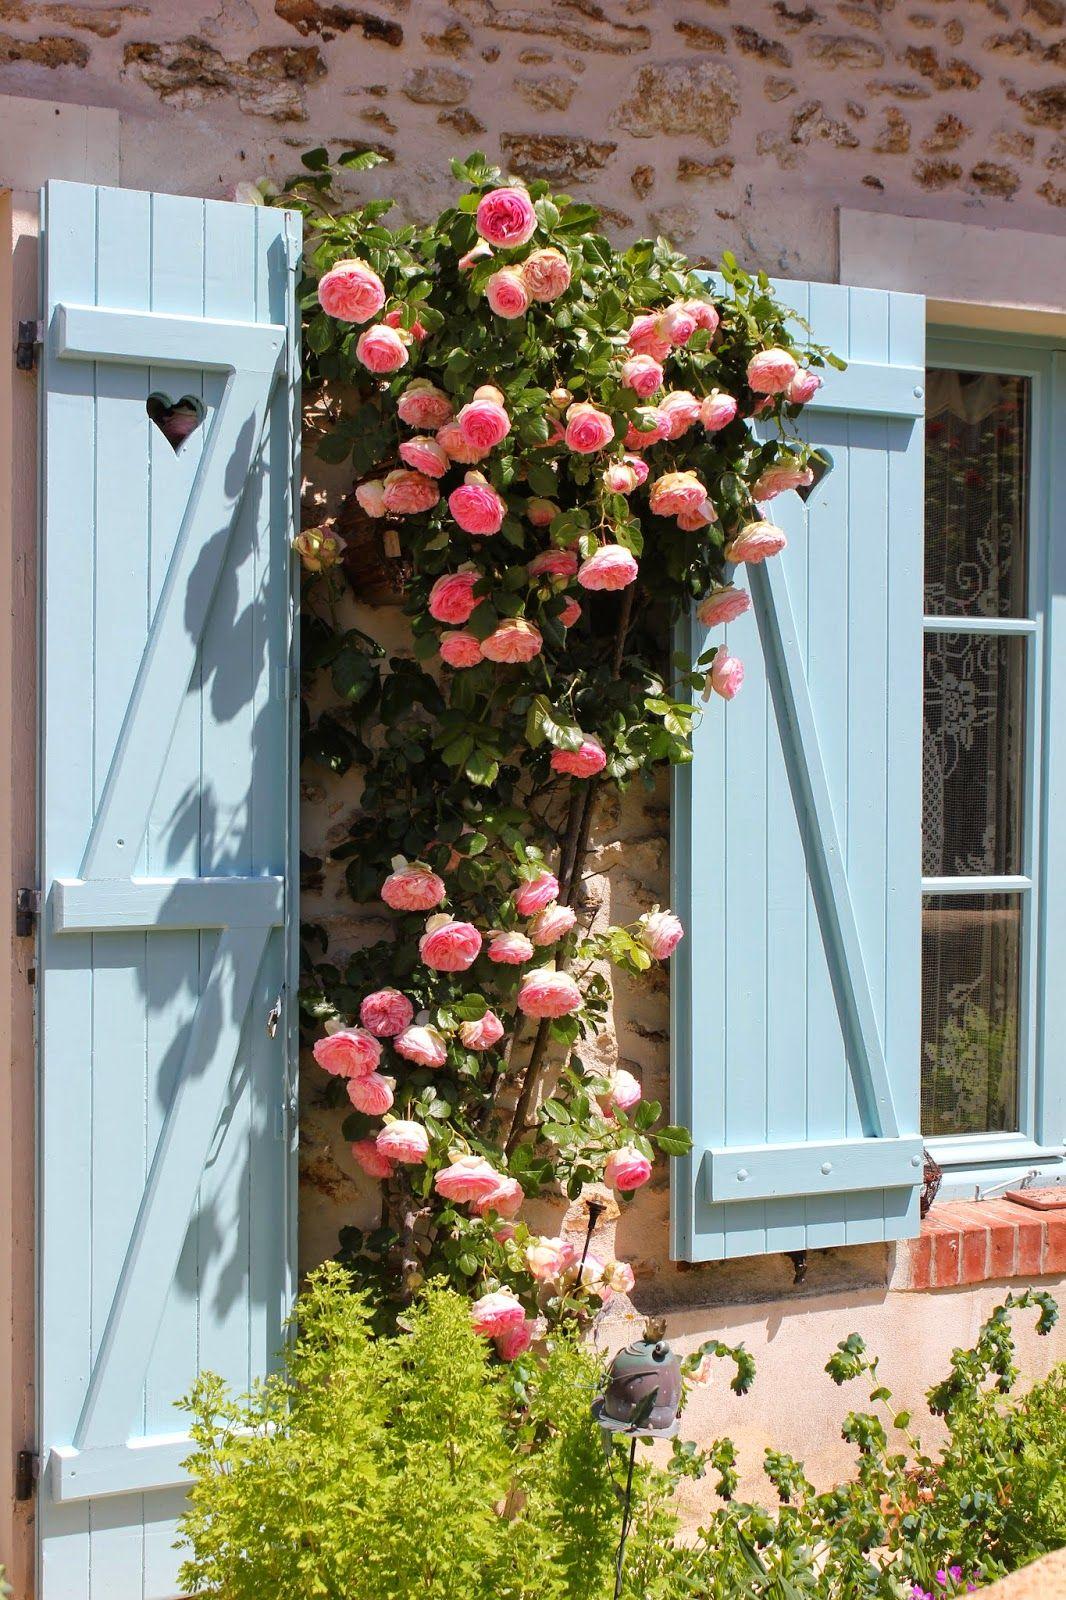 Pierre de Ronsard roses climbing a home's stone wall